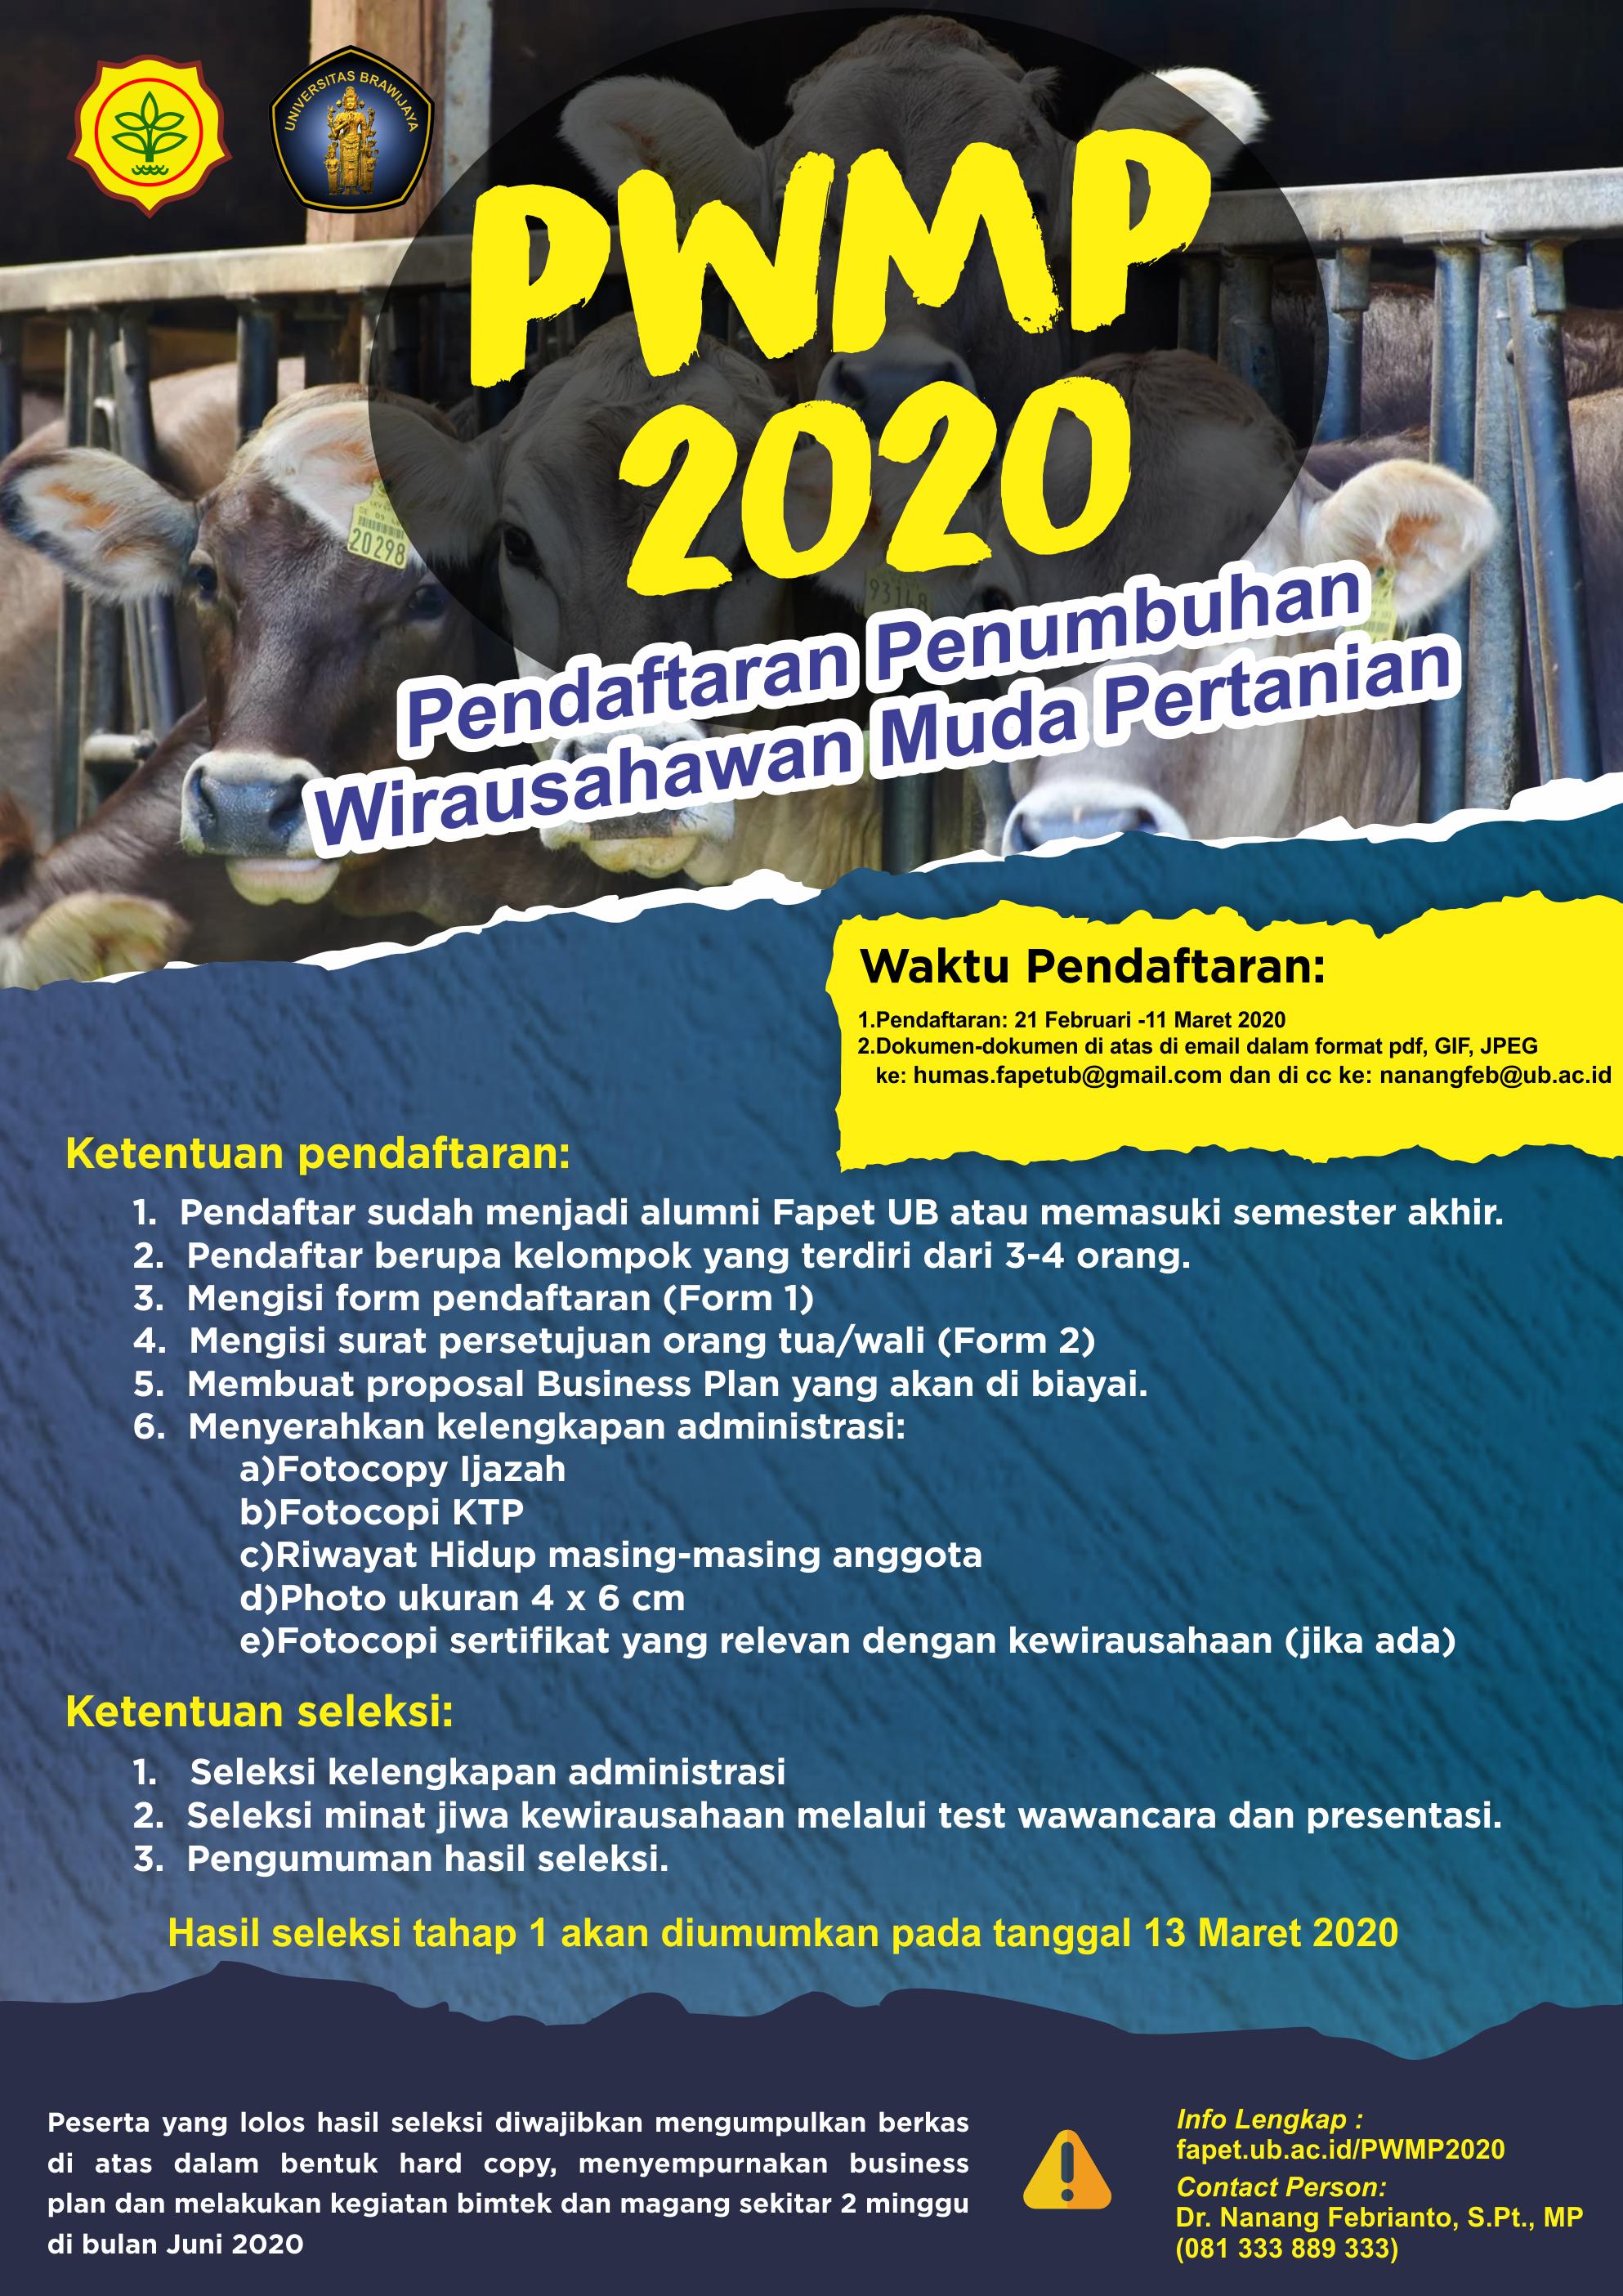 Pendaftaran Penumbuhan Wirausahawan Muda Pertanian (PWMP) 2020